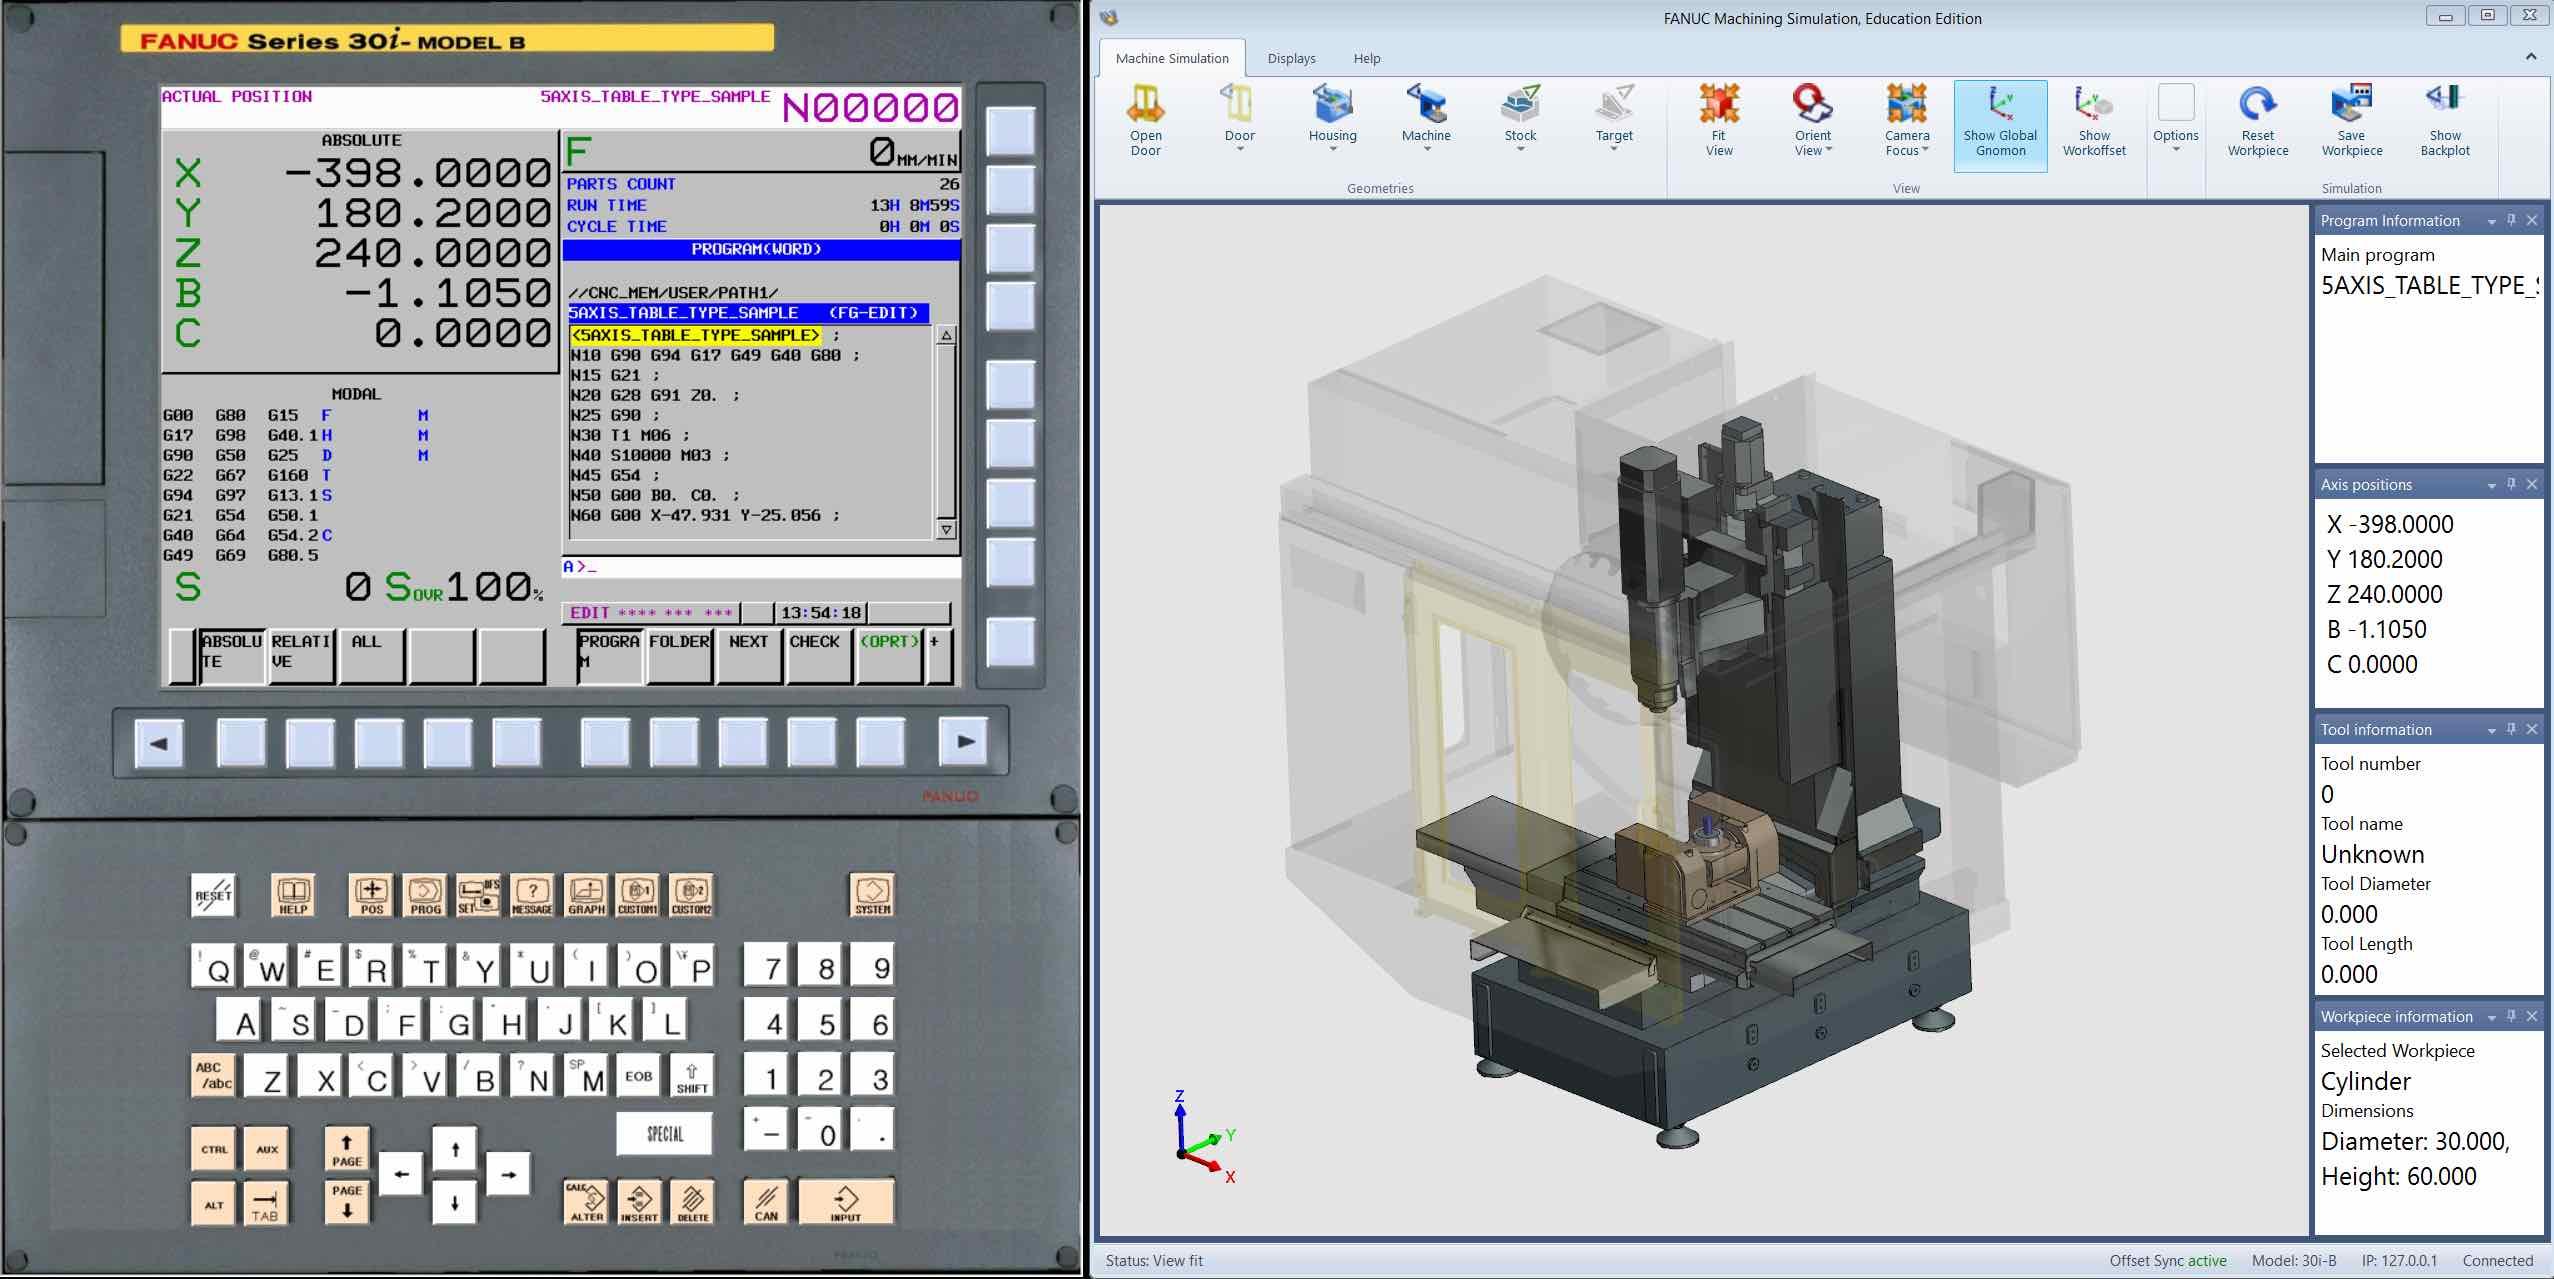 fanuc cnc guide simulation